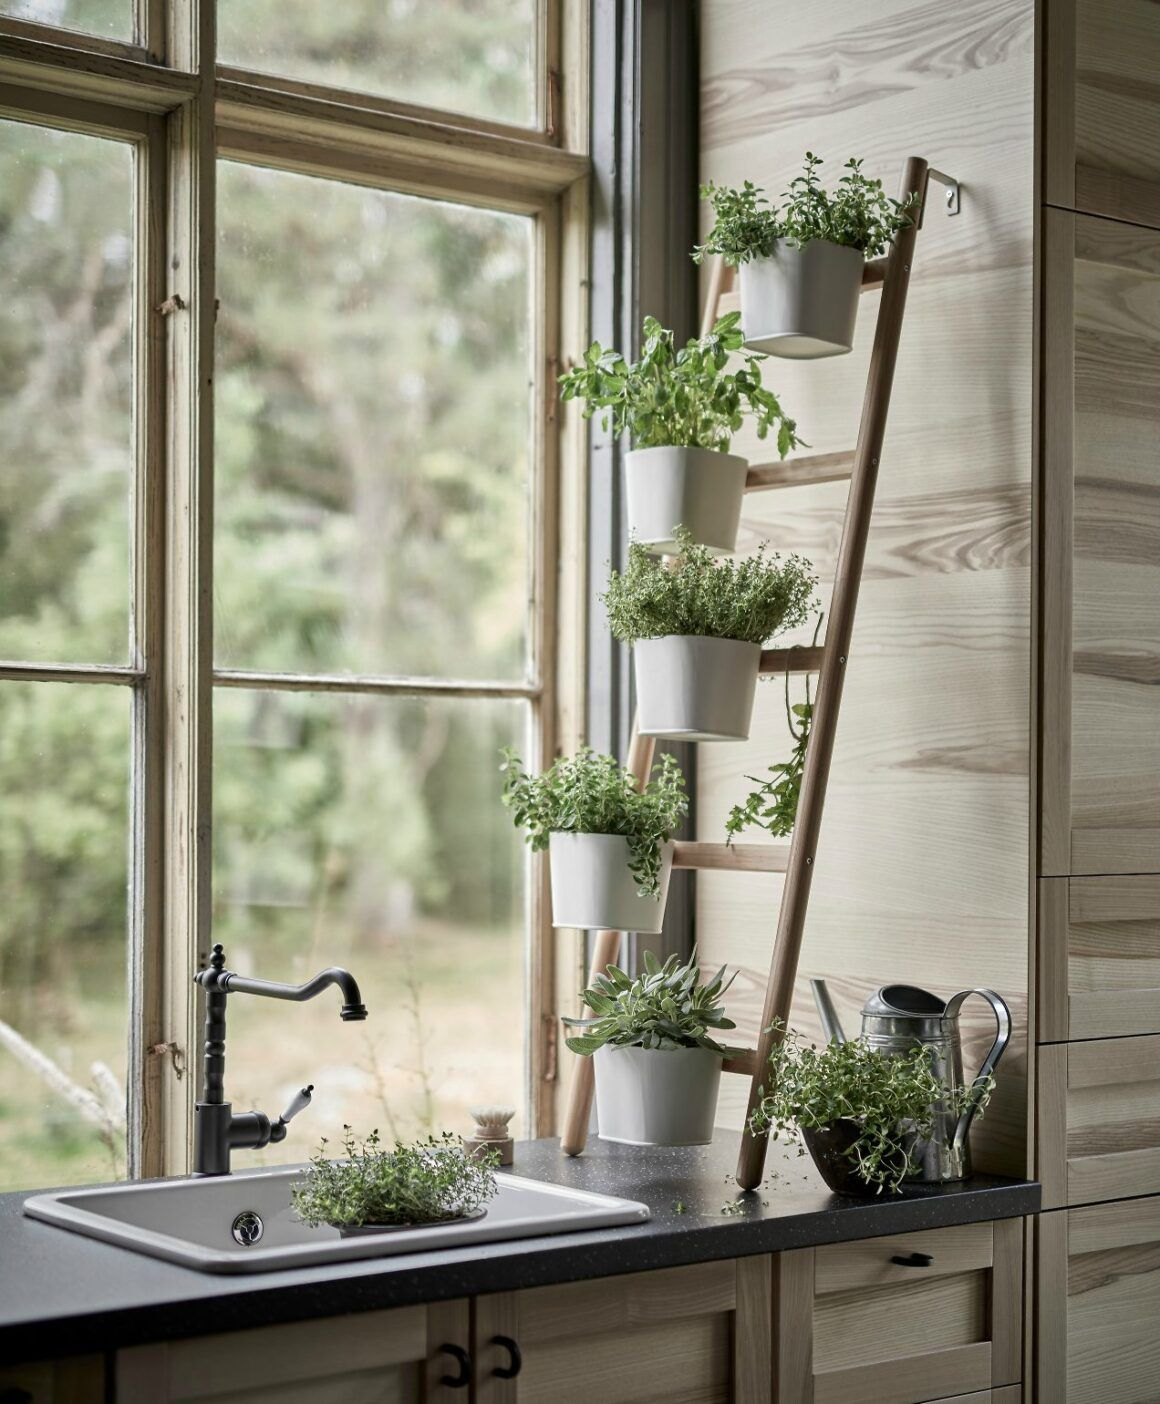 36 diy plant stand ideas for indoor and outdoor decoration herb garden in kitchen home on outdoor kitchen herb garden id=38053